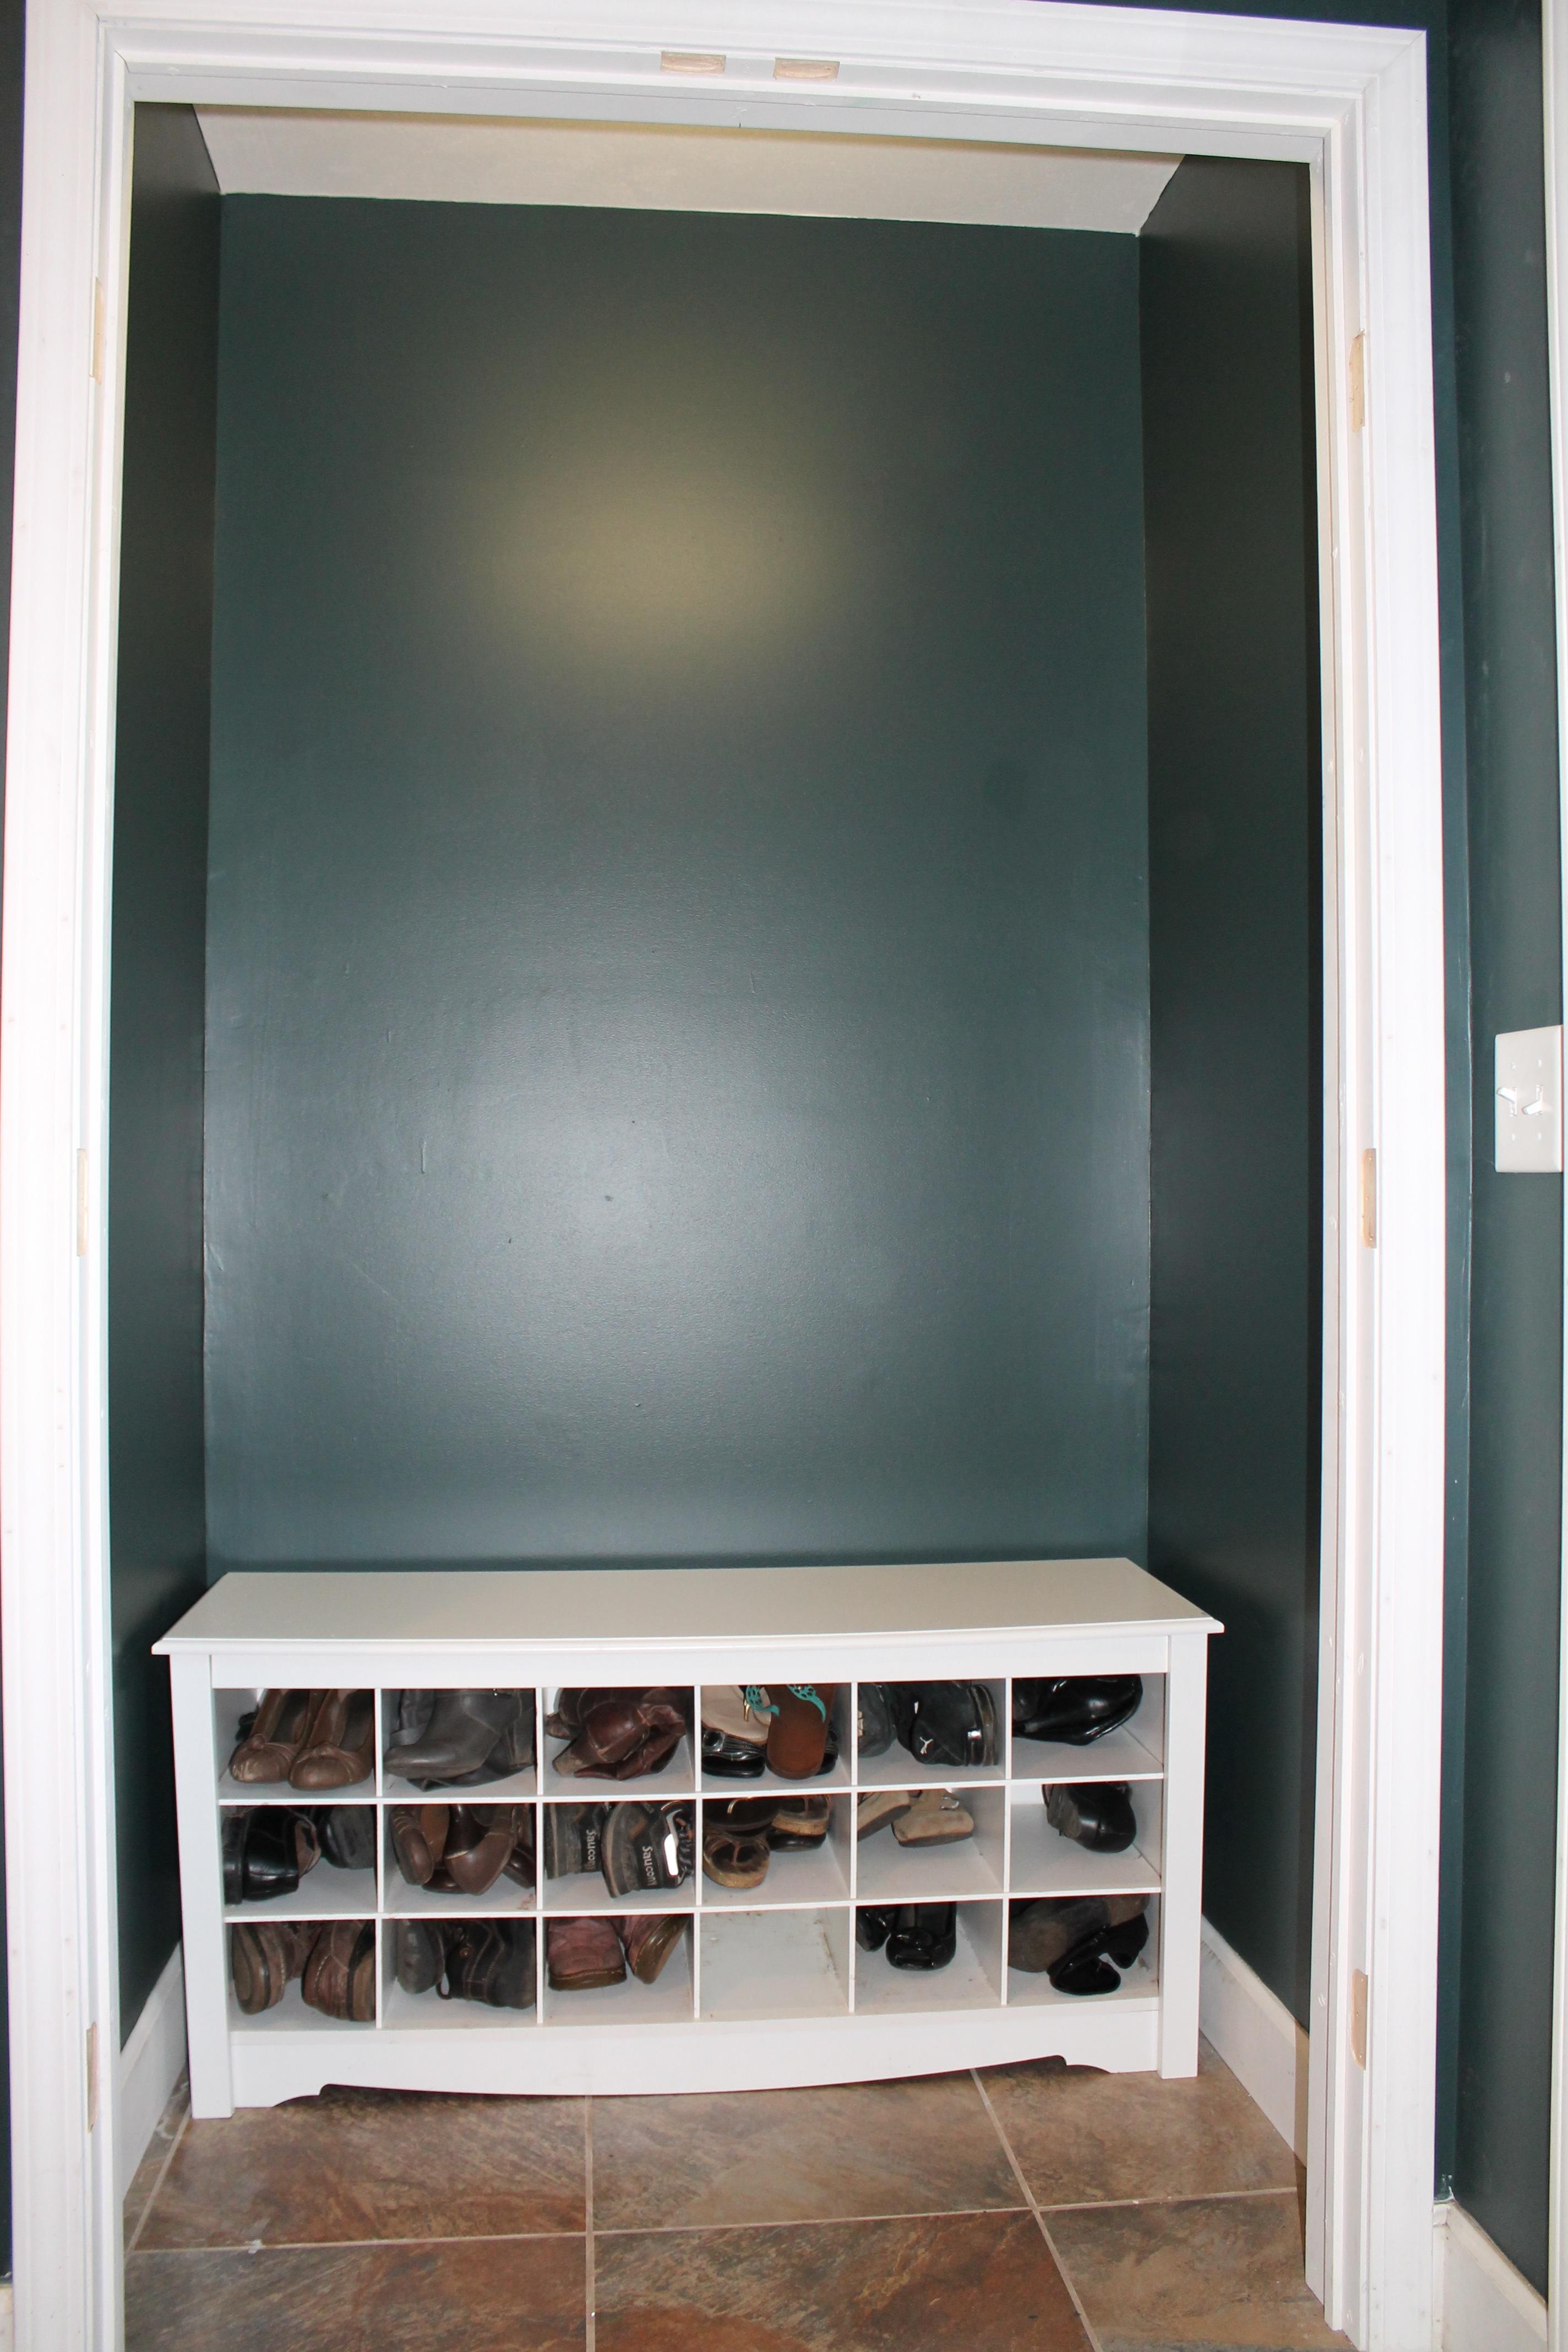 Diy Tilt Out Shoe Storage Bench Plans Wooden Pdf Woodworking Plan With Diy  Closet Shelves Plans